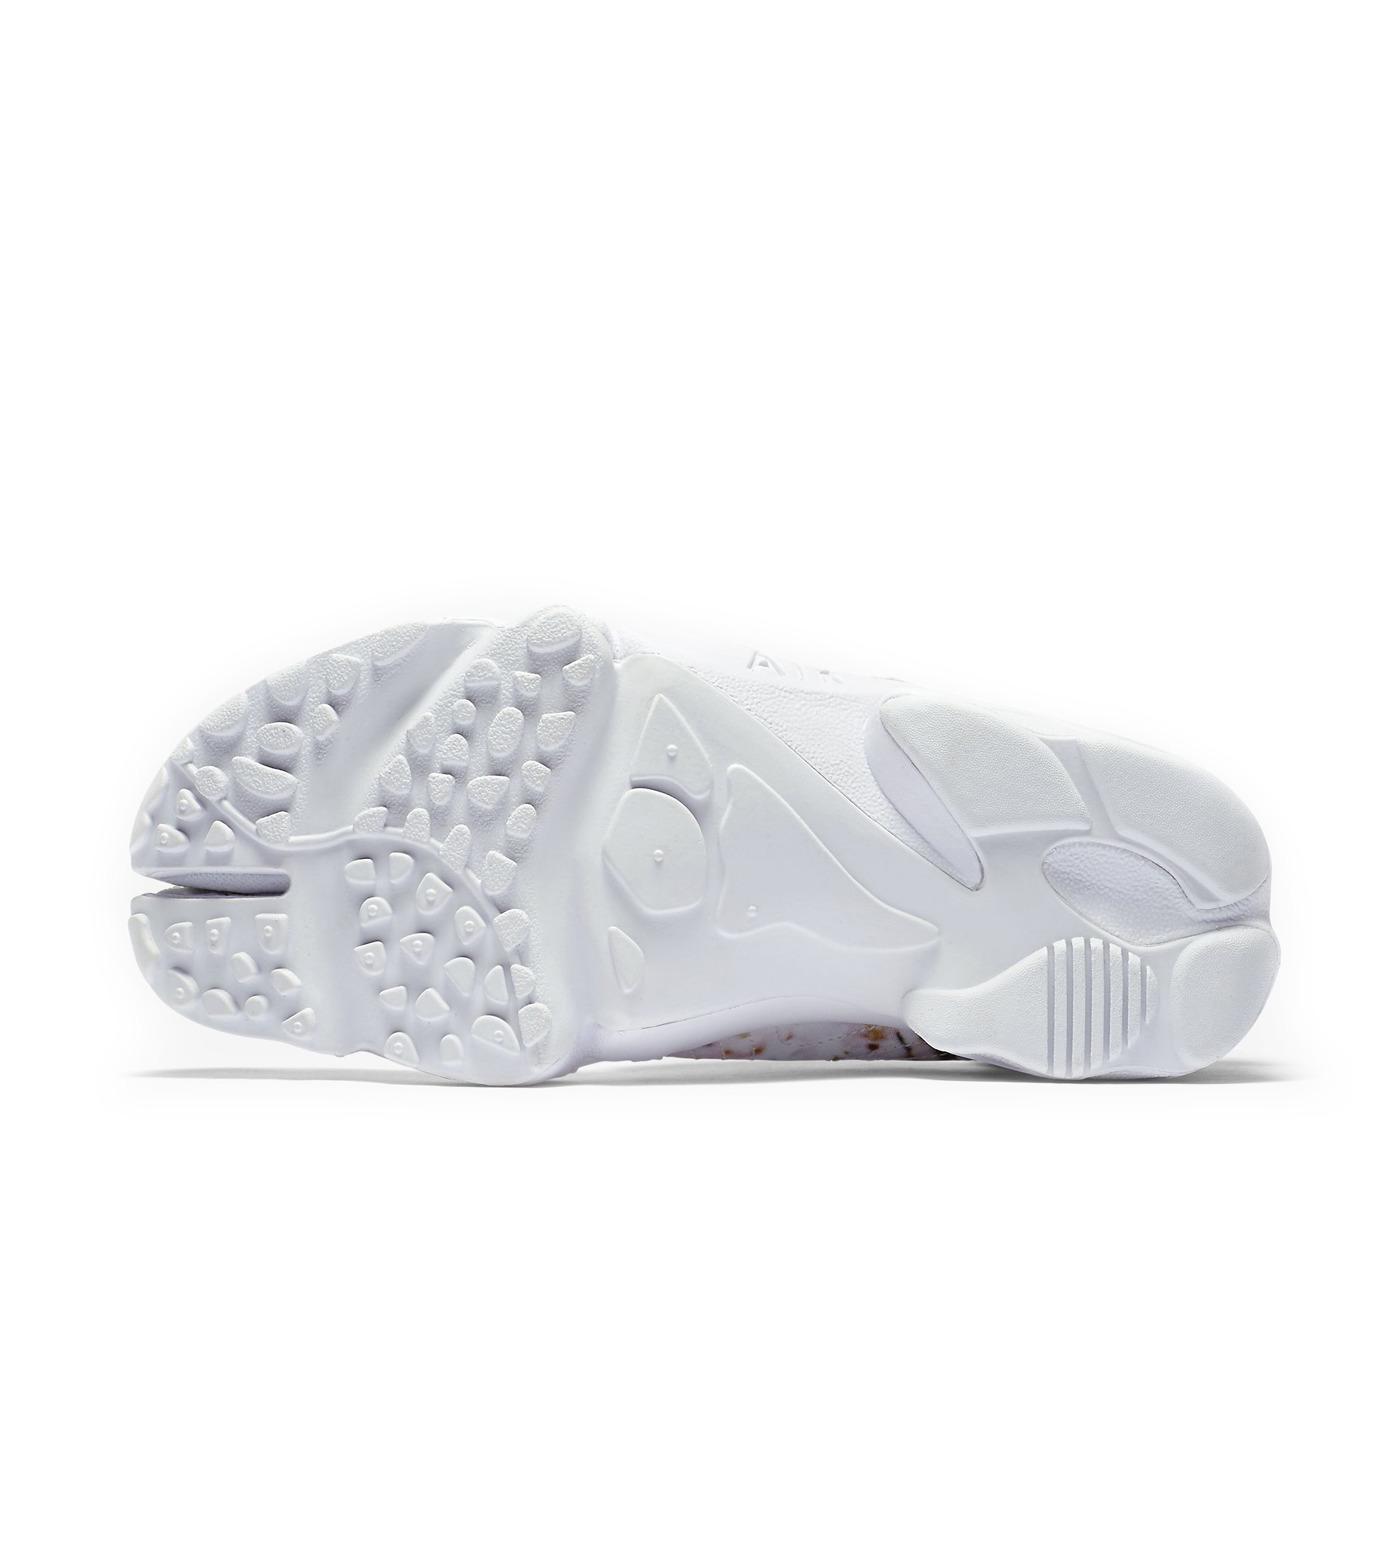 NIKE(ナイキ)のAIR RIFT PRINT-WHITE(シューズ/shoes)-807398-101-4 拡大詳細画像3